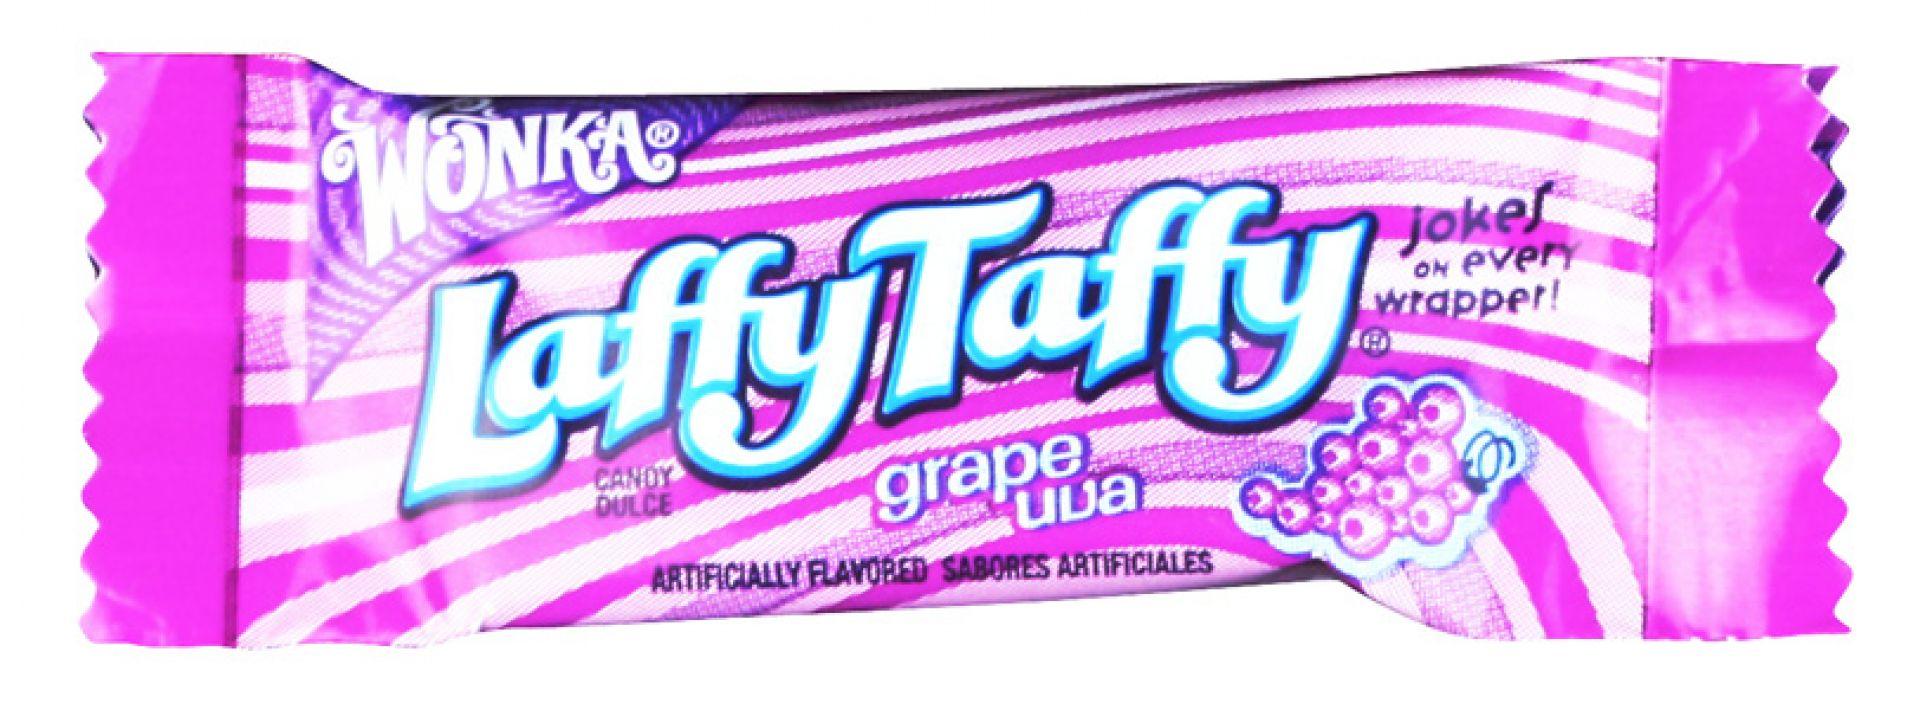 LaffyTaffy grape uva